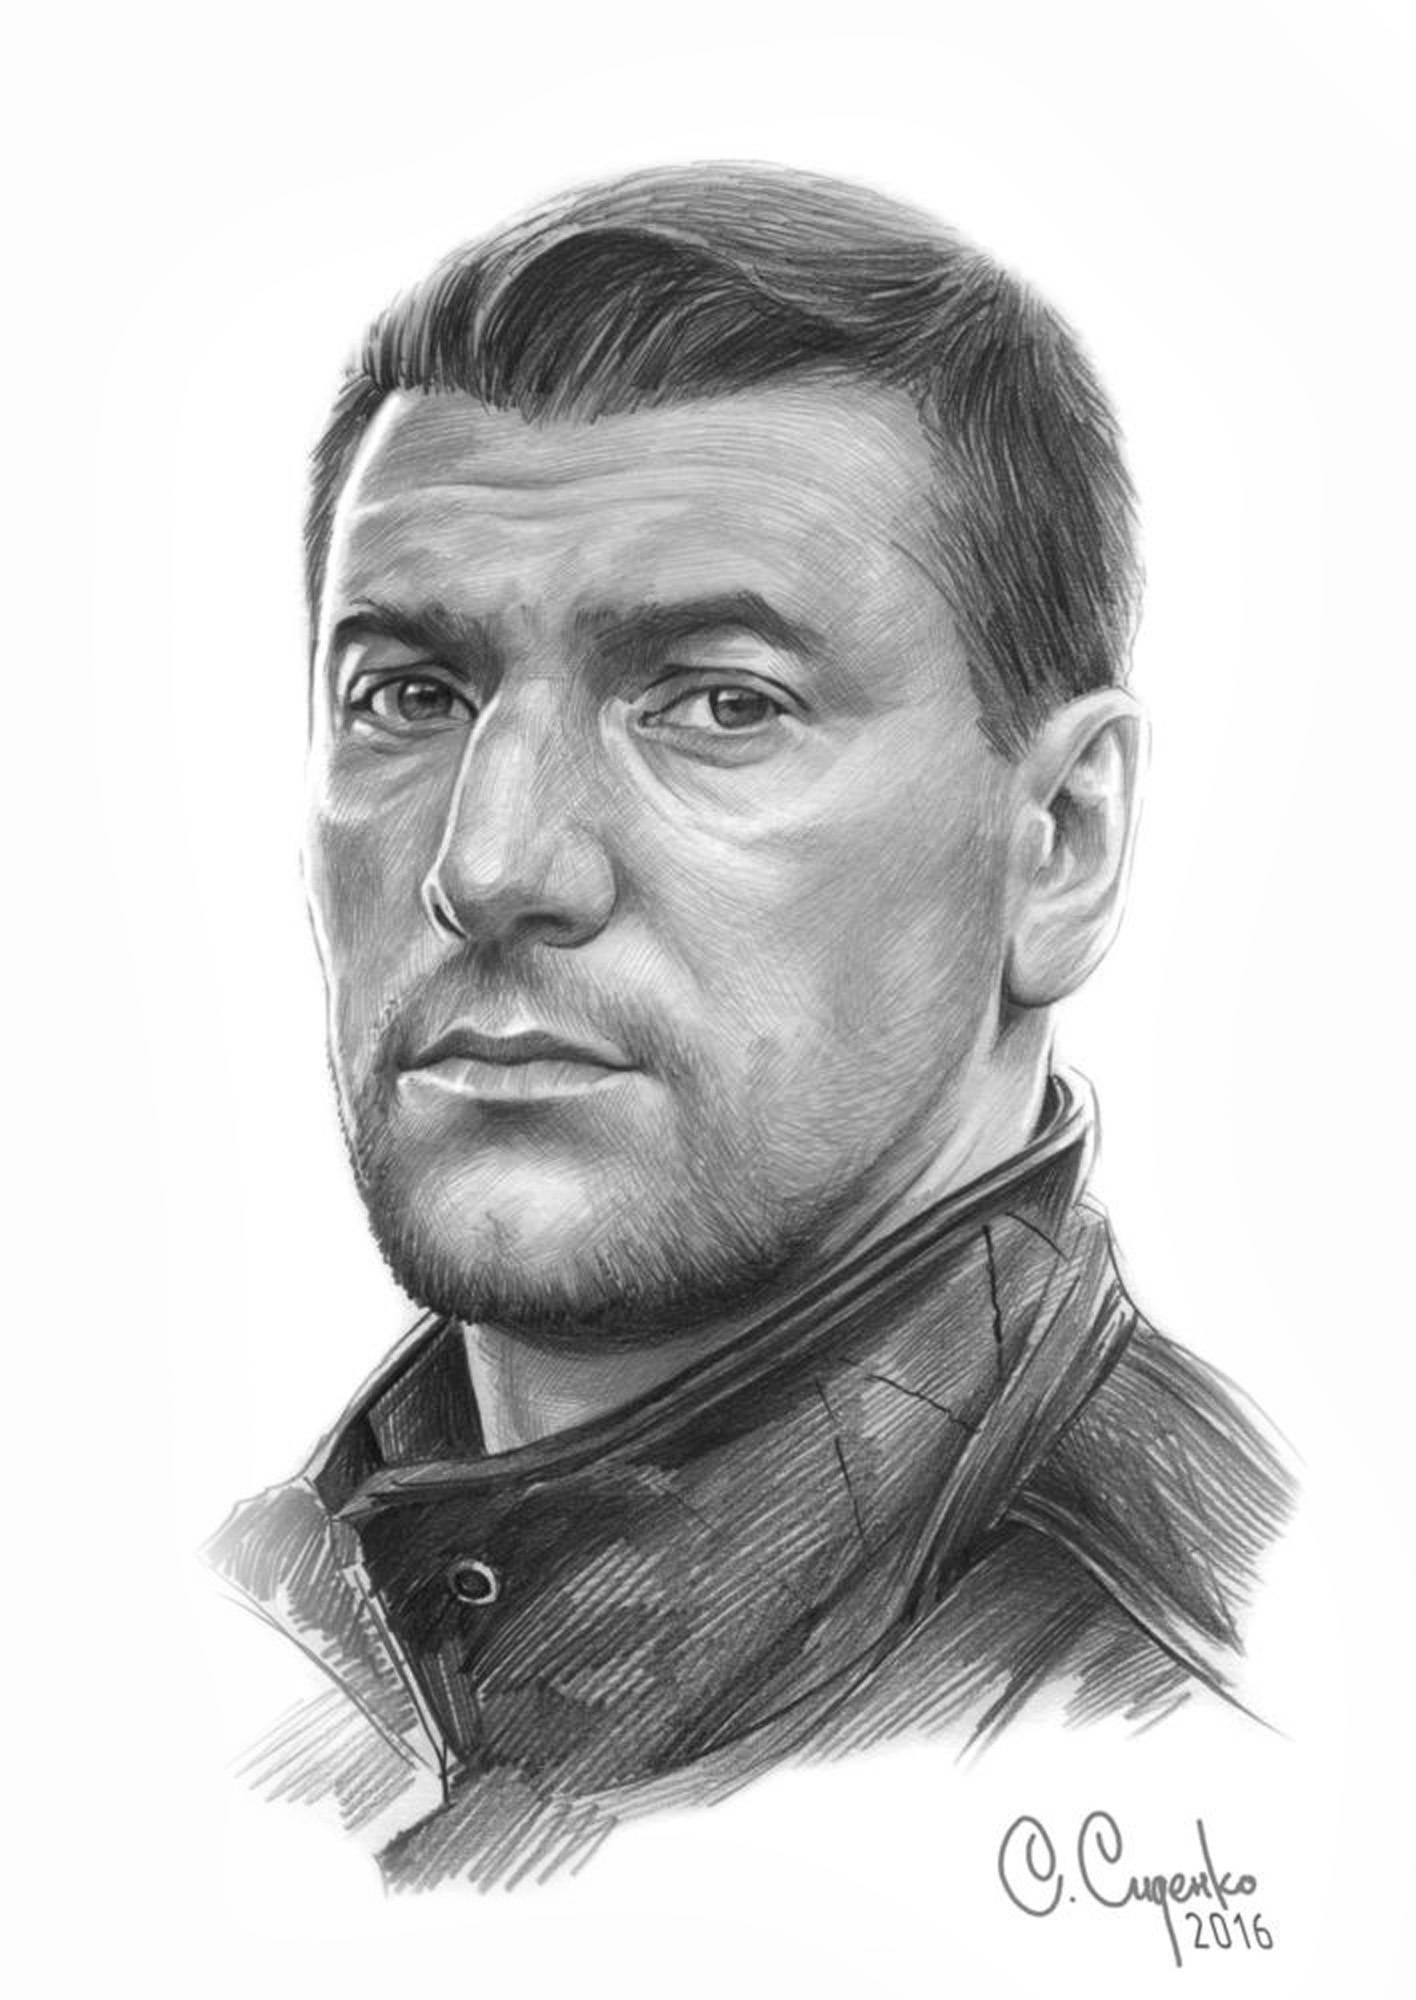 """Портрет А. Устюгова"" (бумага/карандаш) 20х30см, 2016 г."